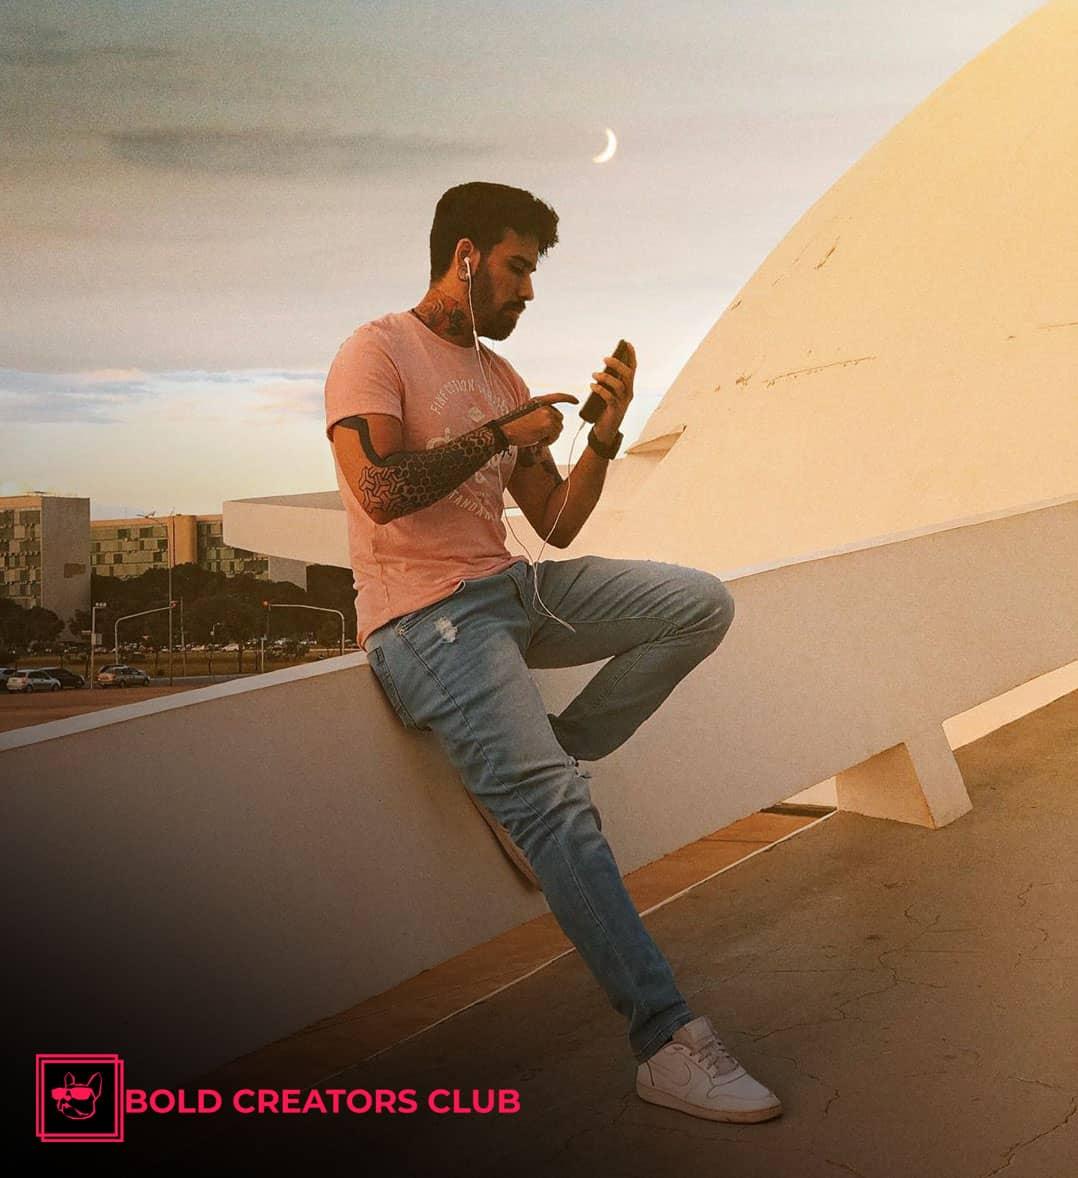 Raphael Salles Bold Creators Club Influencer Marketing Agency South America Brazil